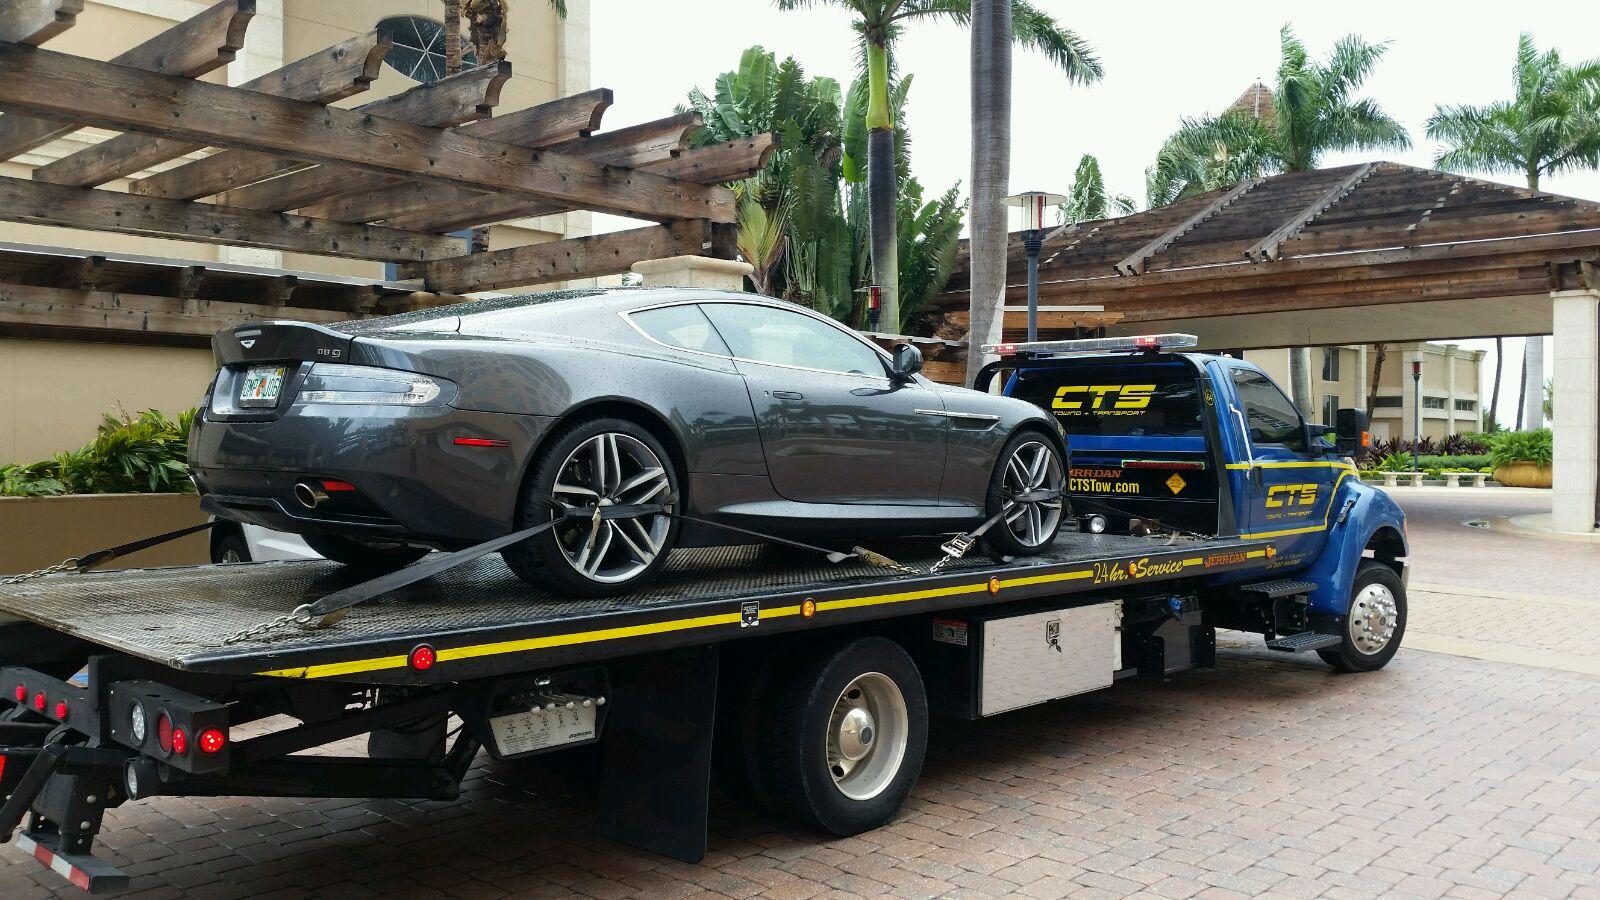 Aston Martin on Rollback CTS Tow Truck